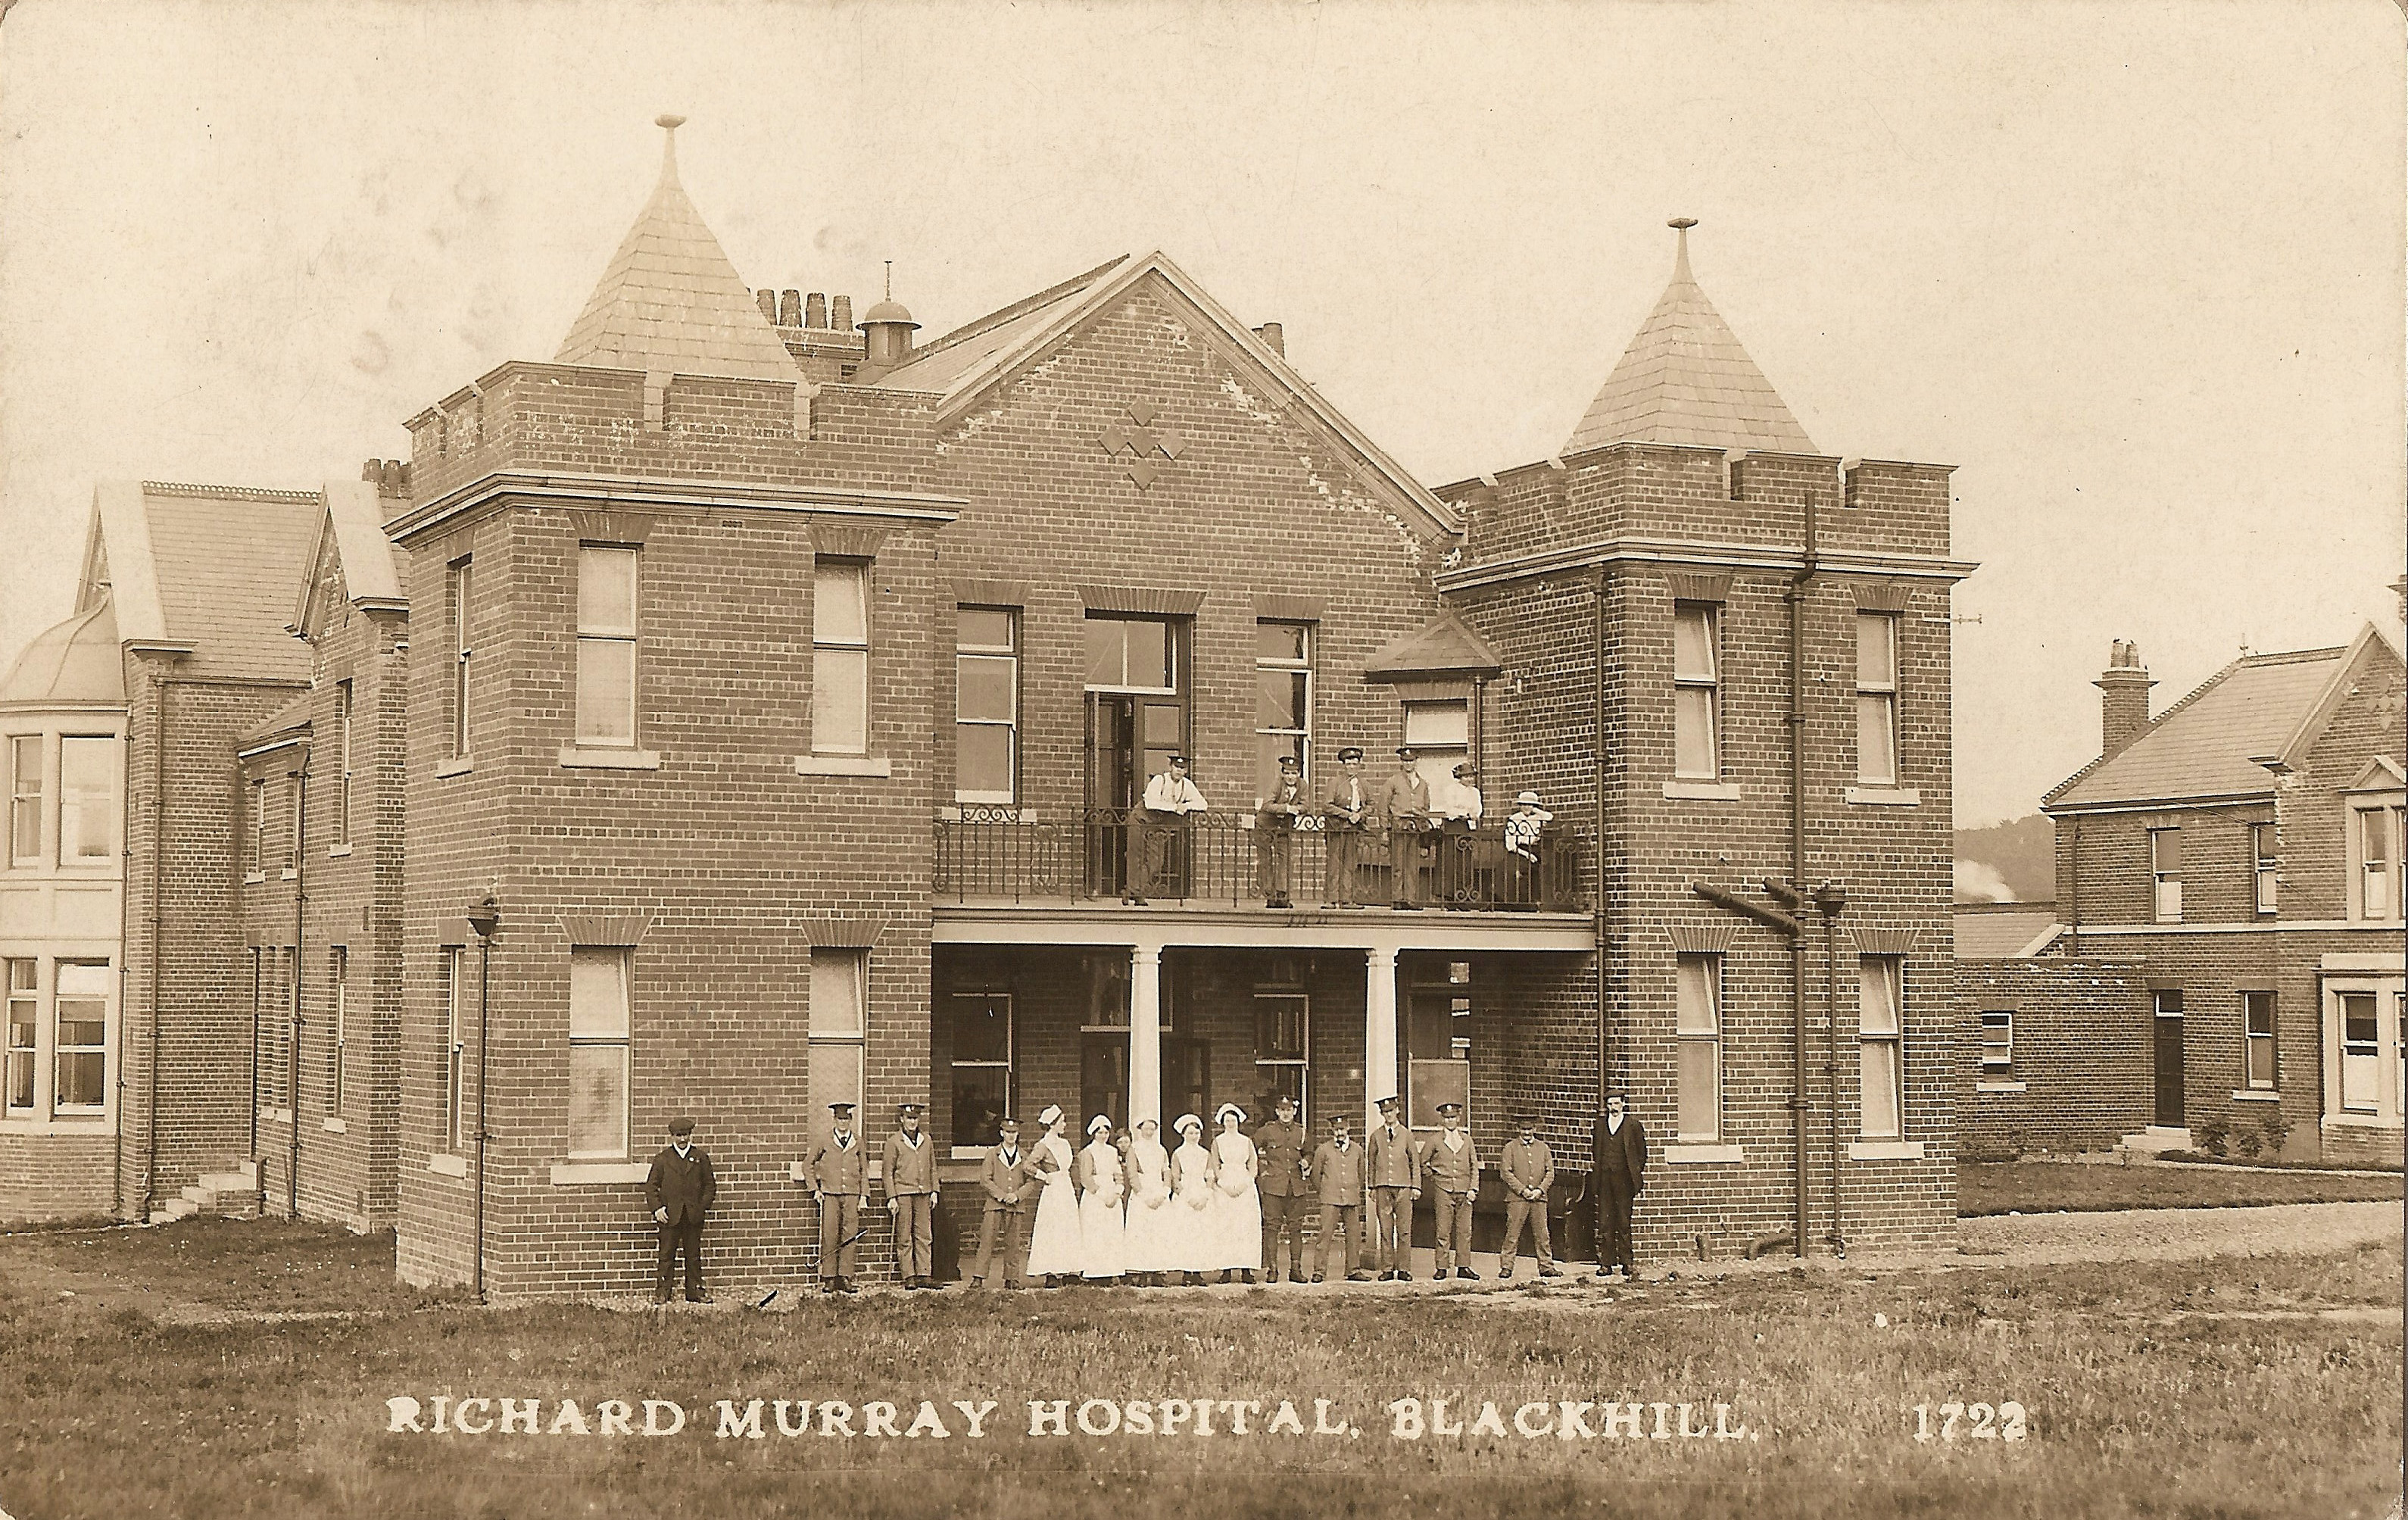 Richard Murray Hospital